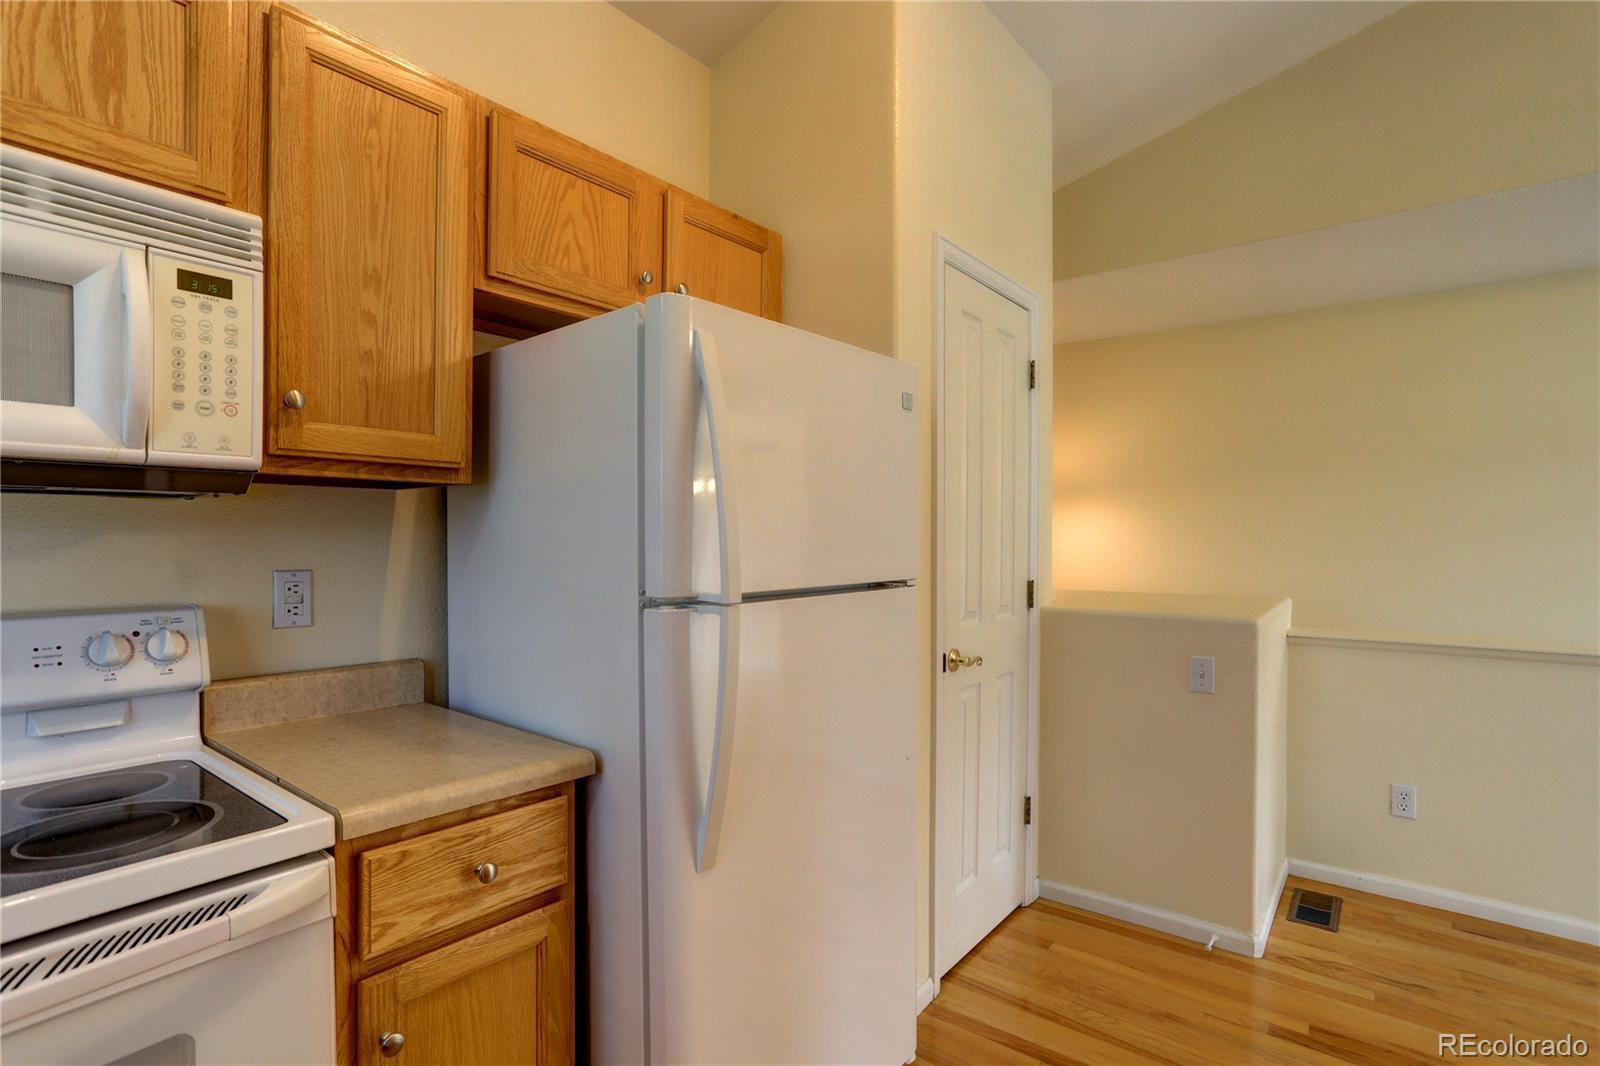 MLS# 2836182 - 12 - 7700 W Grant Ranch Boulevard #10D, Littleton, CO 80123